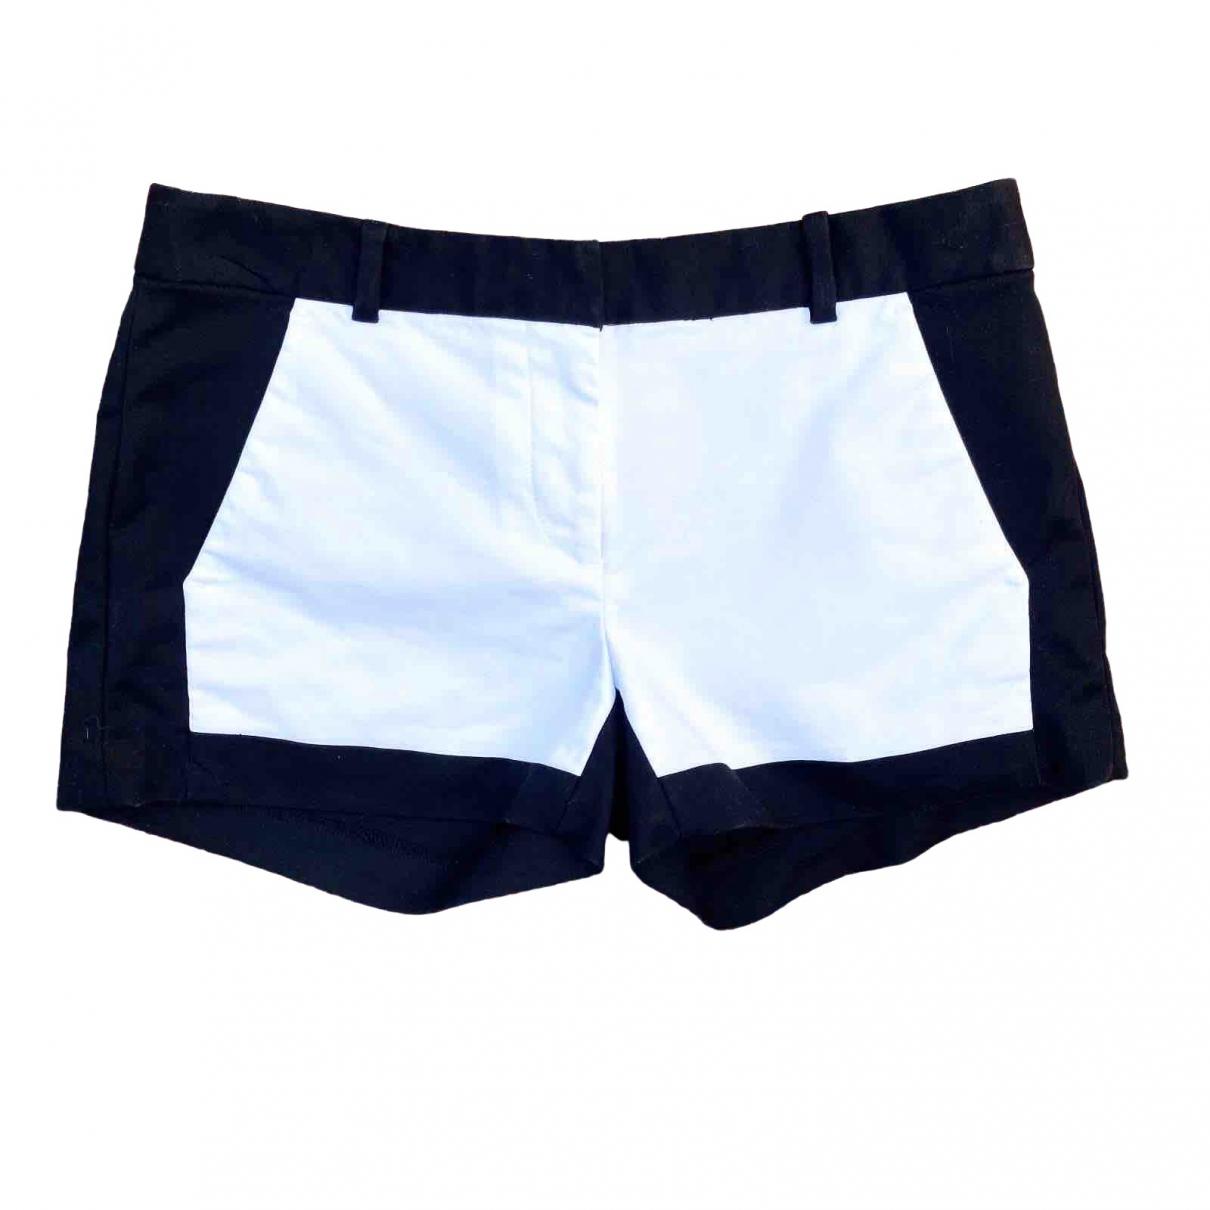 Michael Kors \N Shorts in  Schwarz Baumwolle